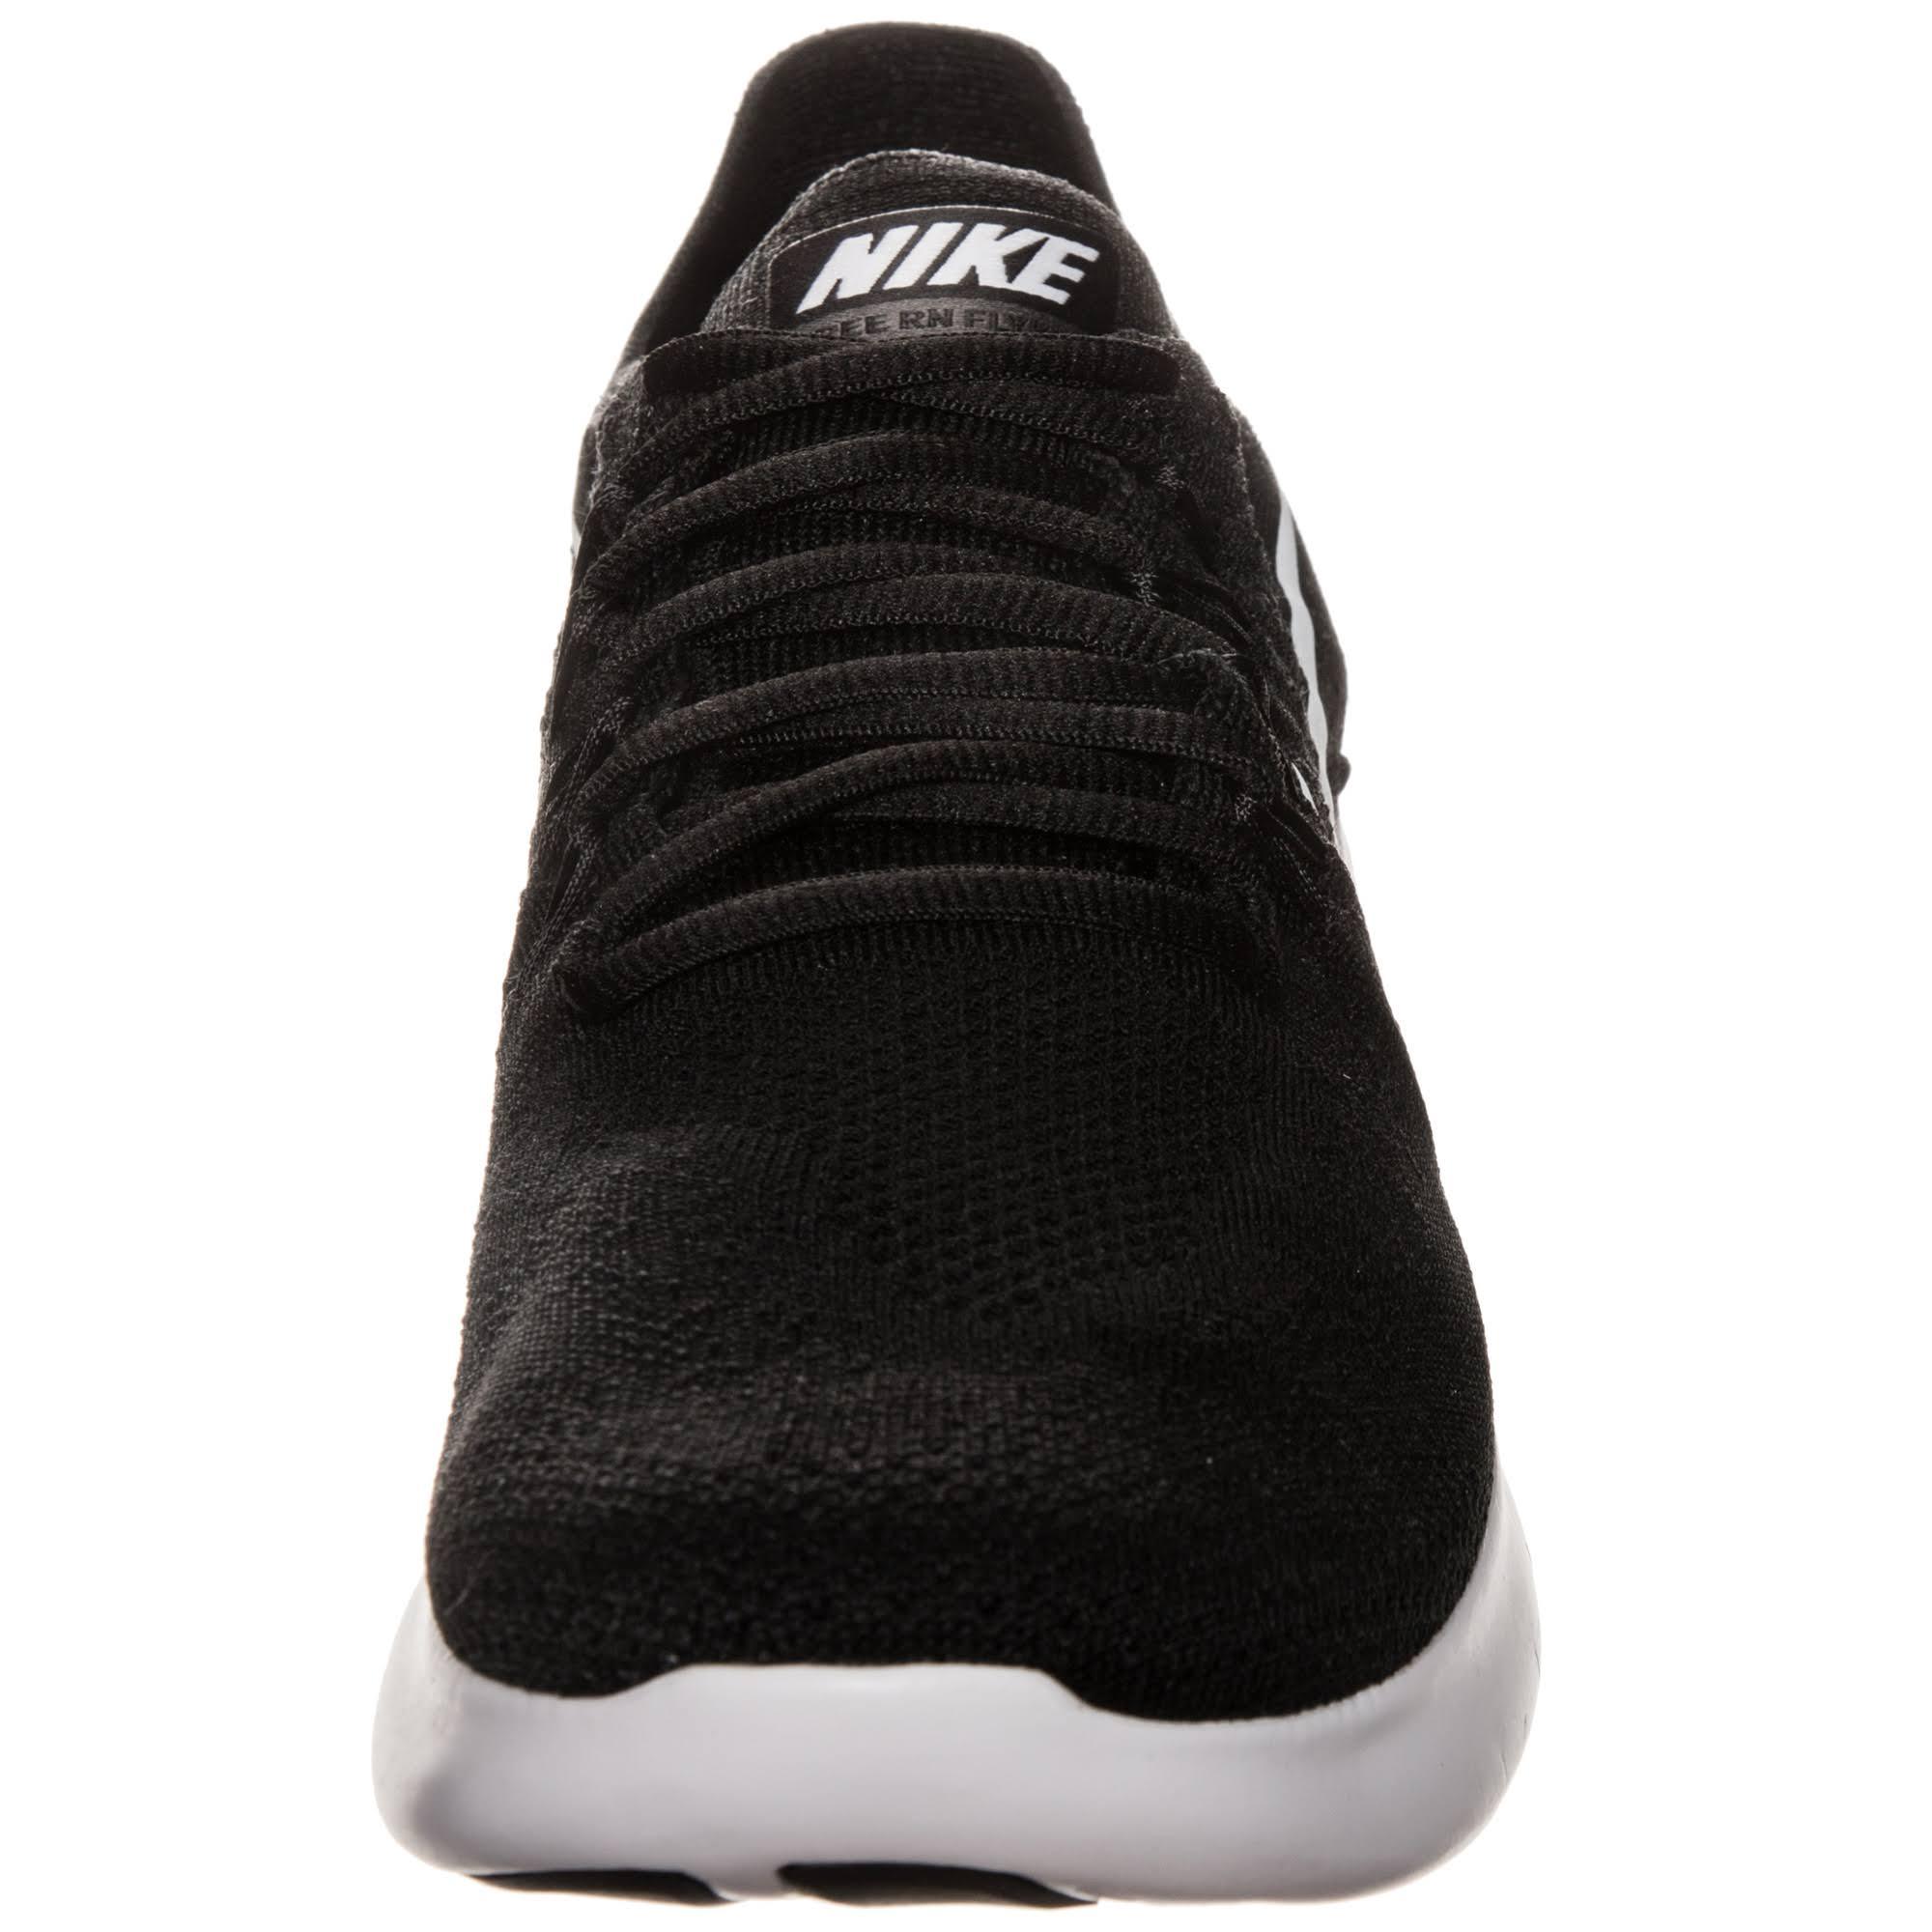 880843 Schwarze 001 Nike Sneaker Flyknit Run – Running Free white Black black O4OqwxX0f